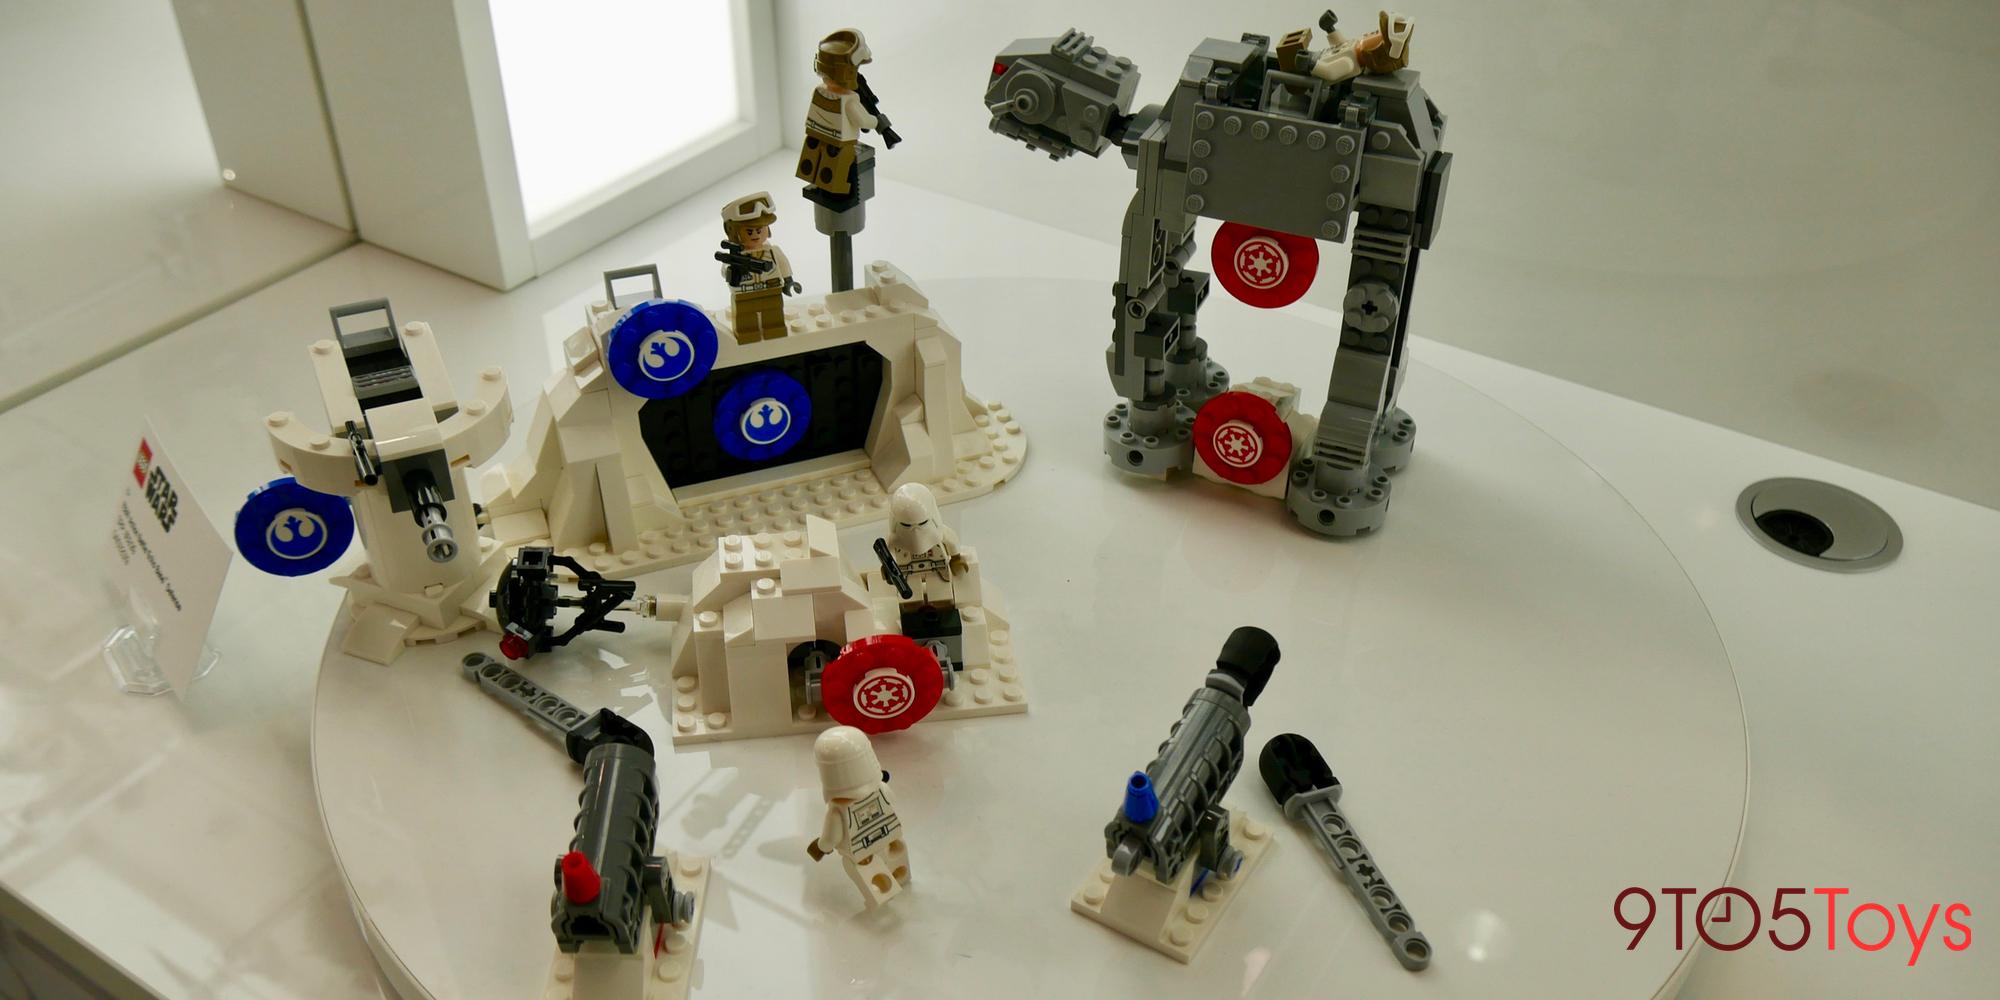 LEGO Star Wars Action Battle